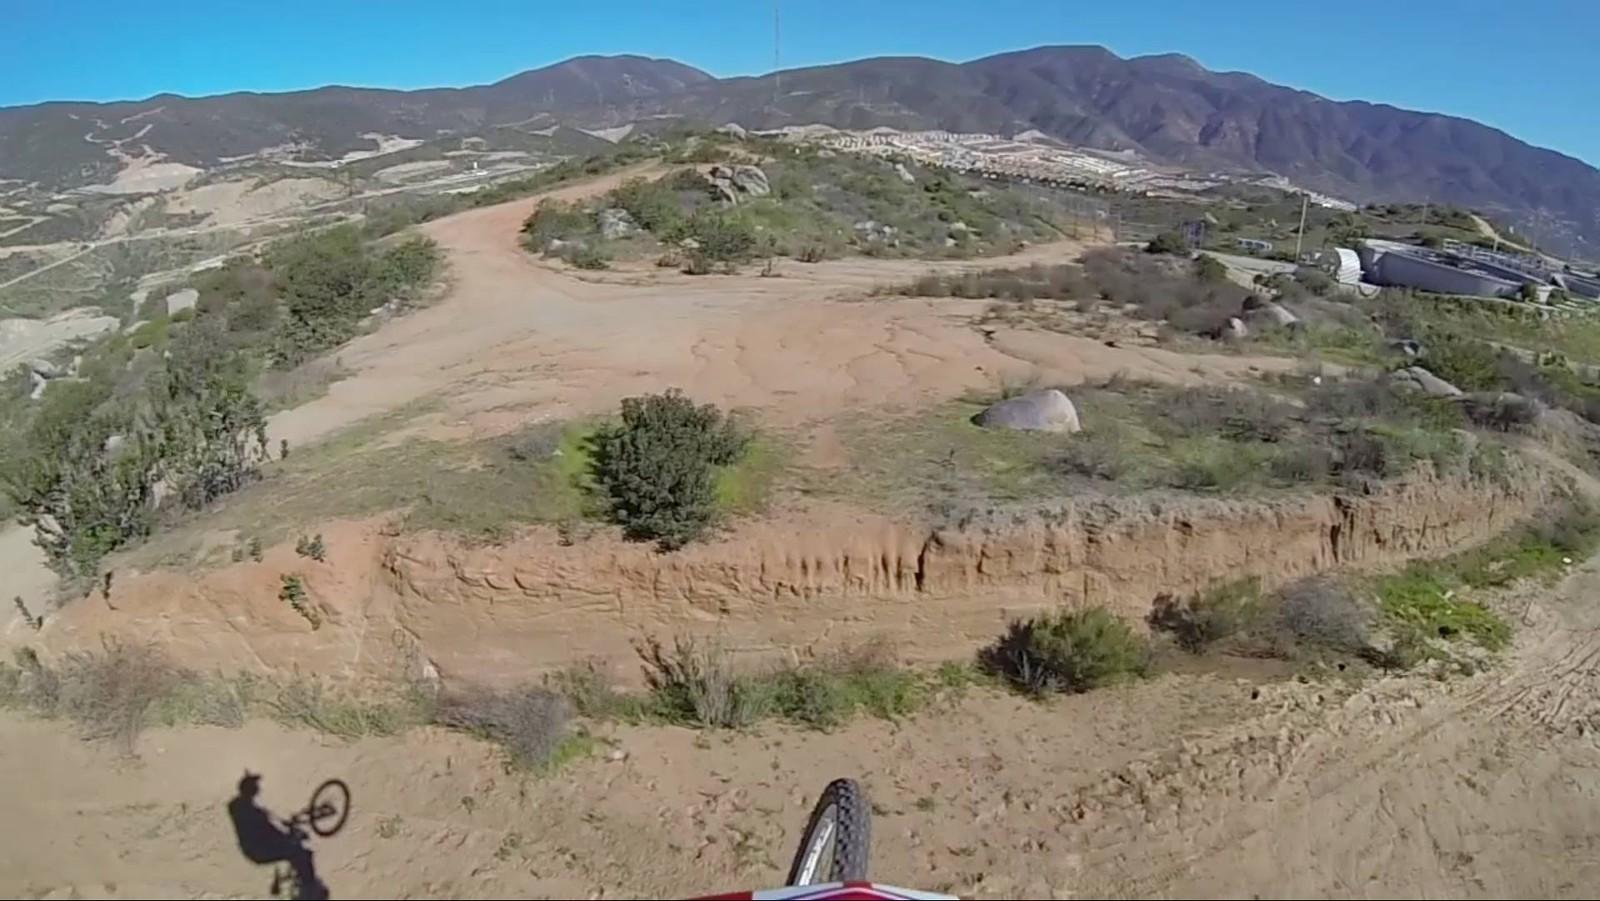 GAP2 - guillermo - Mountain Biking Pictures - Vital MTB